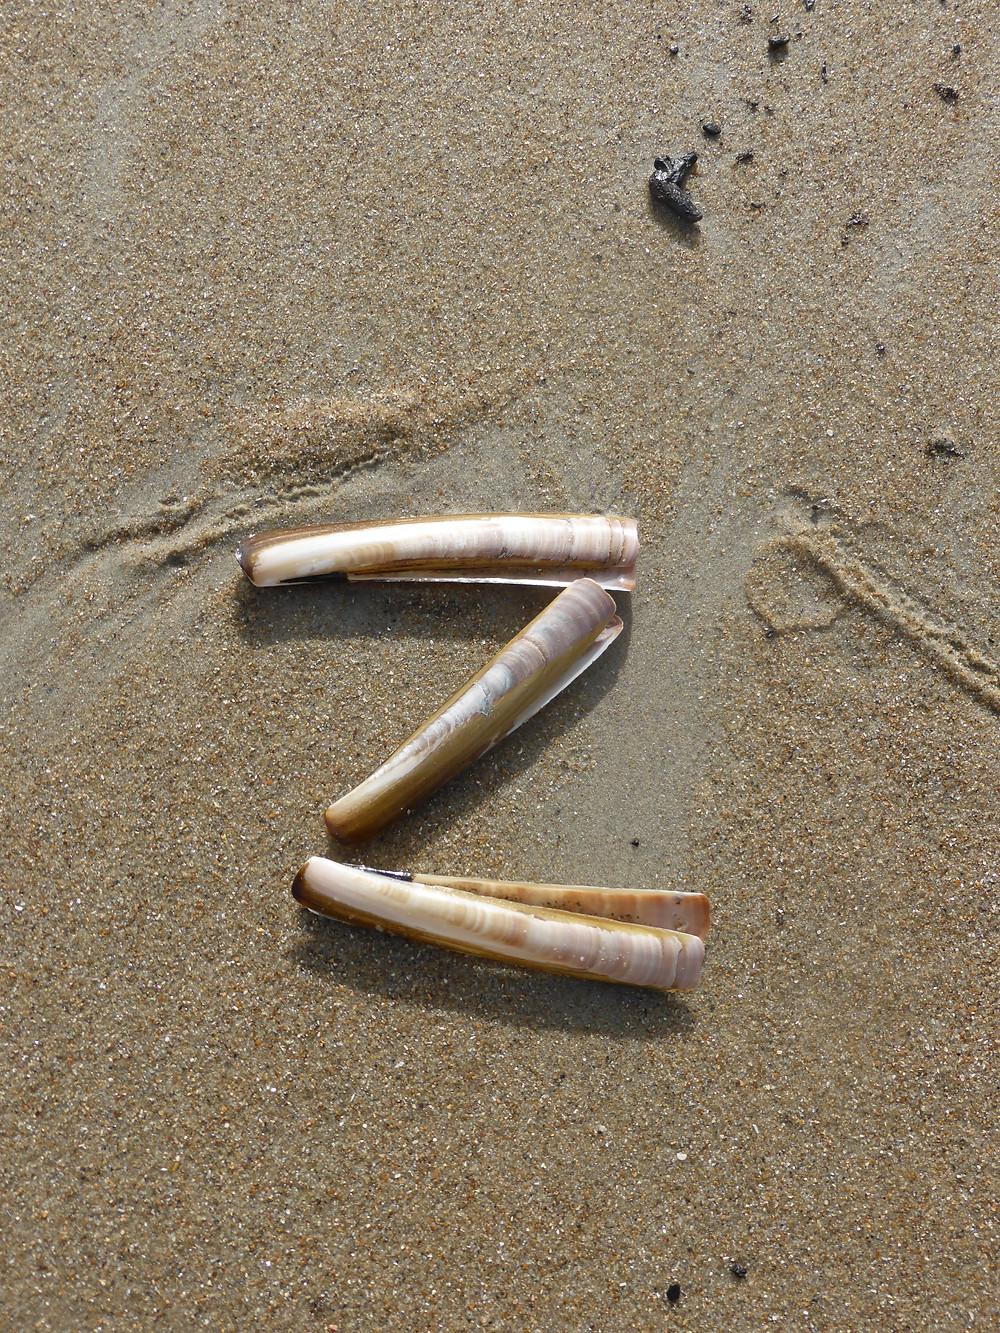 Z from Zoutbeach